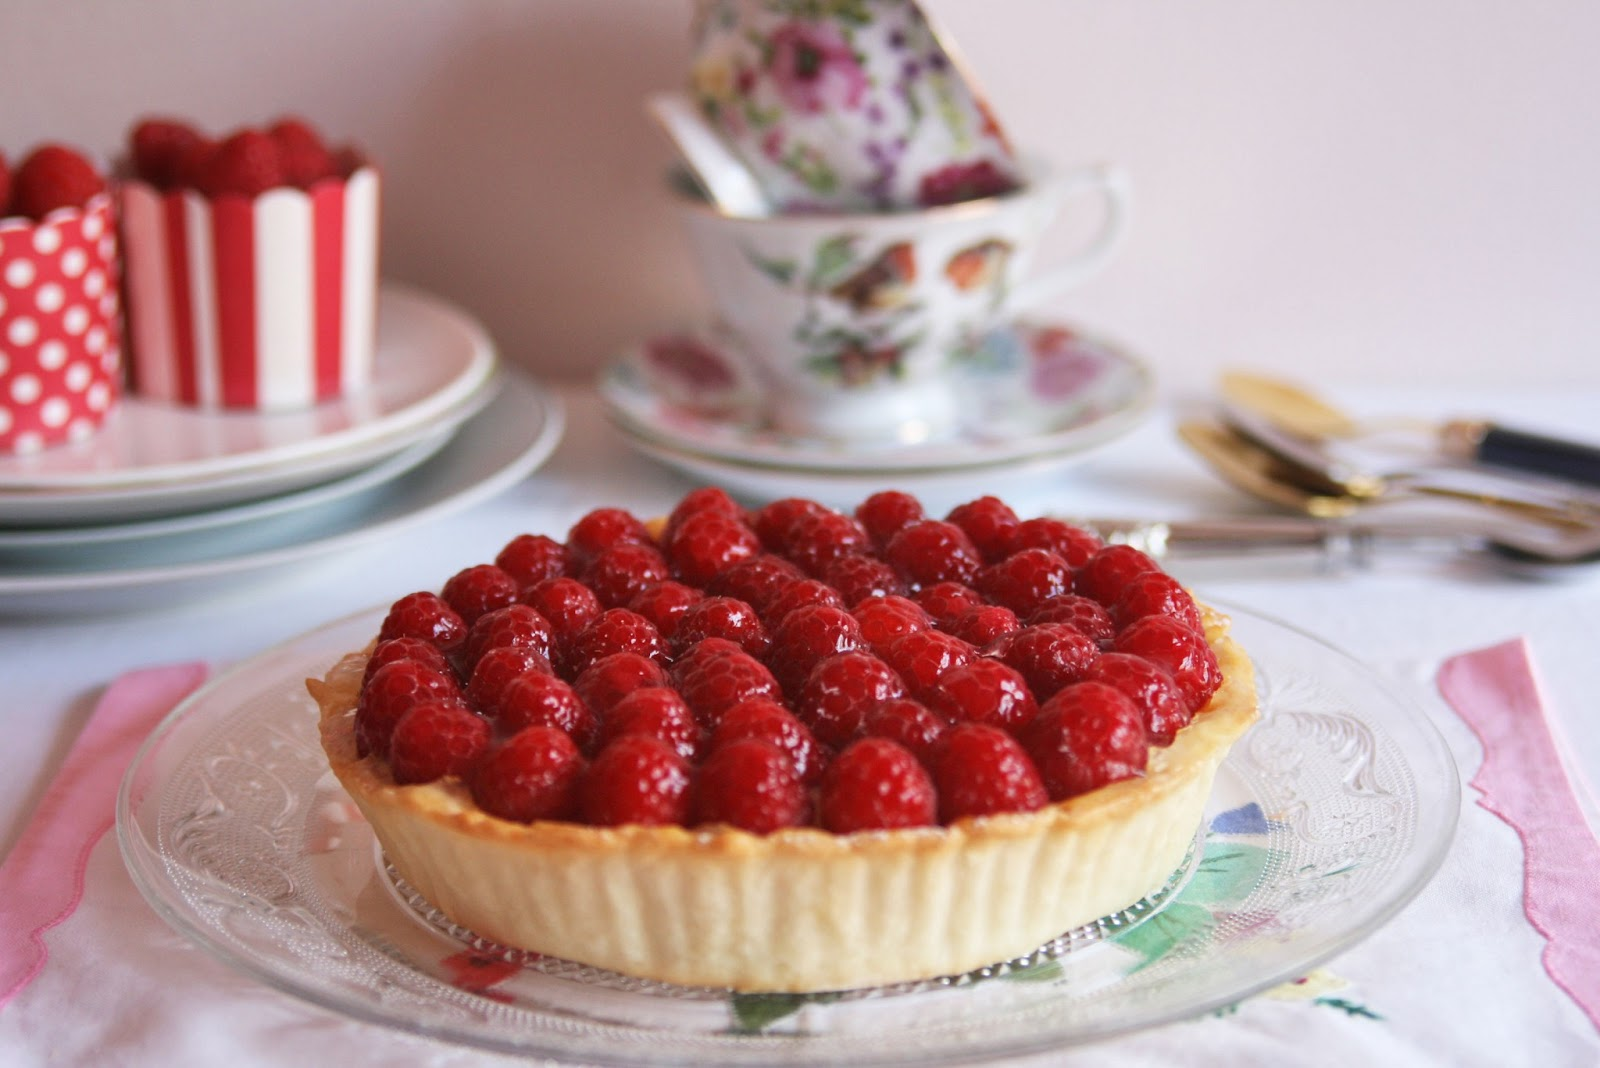 Cinnamon Girl: Raspberry and Cinnamon Custard Tart